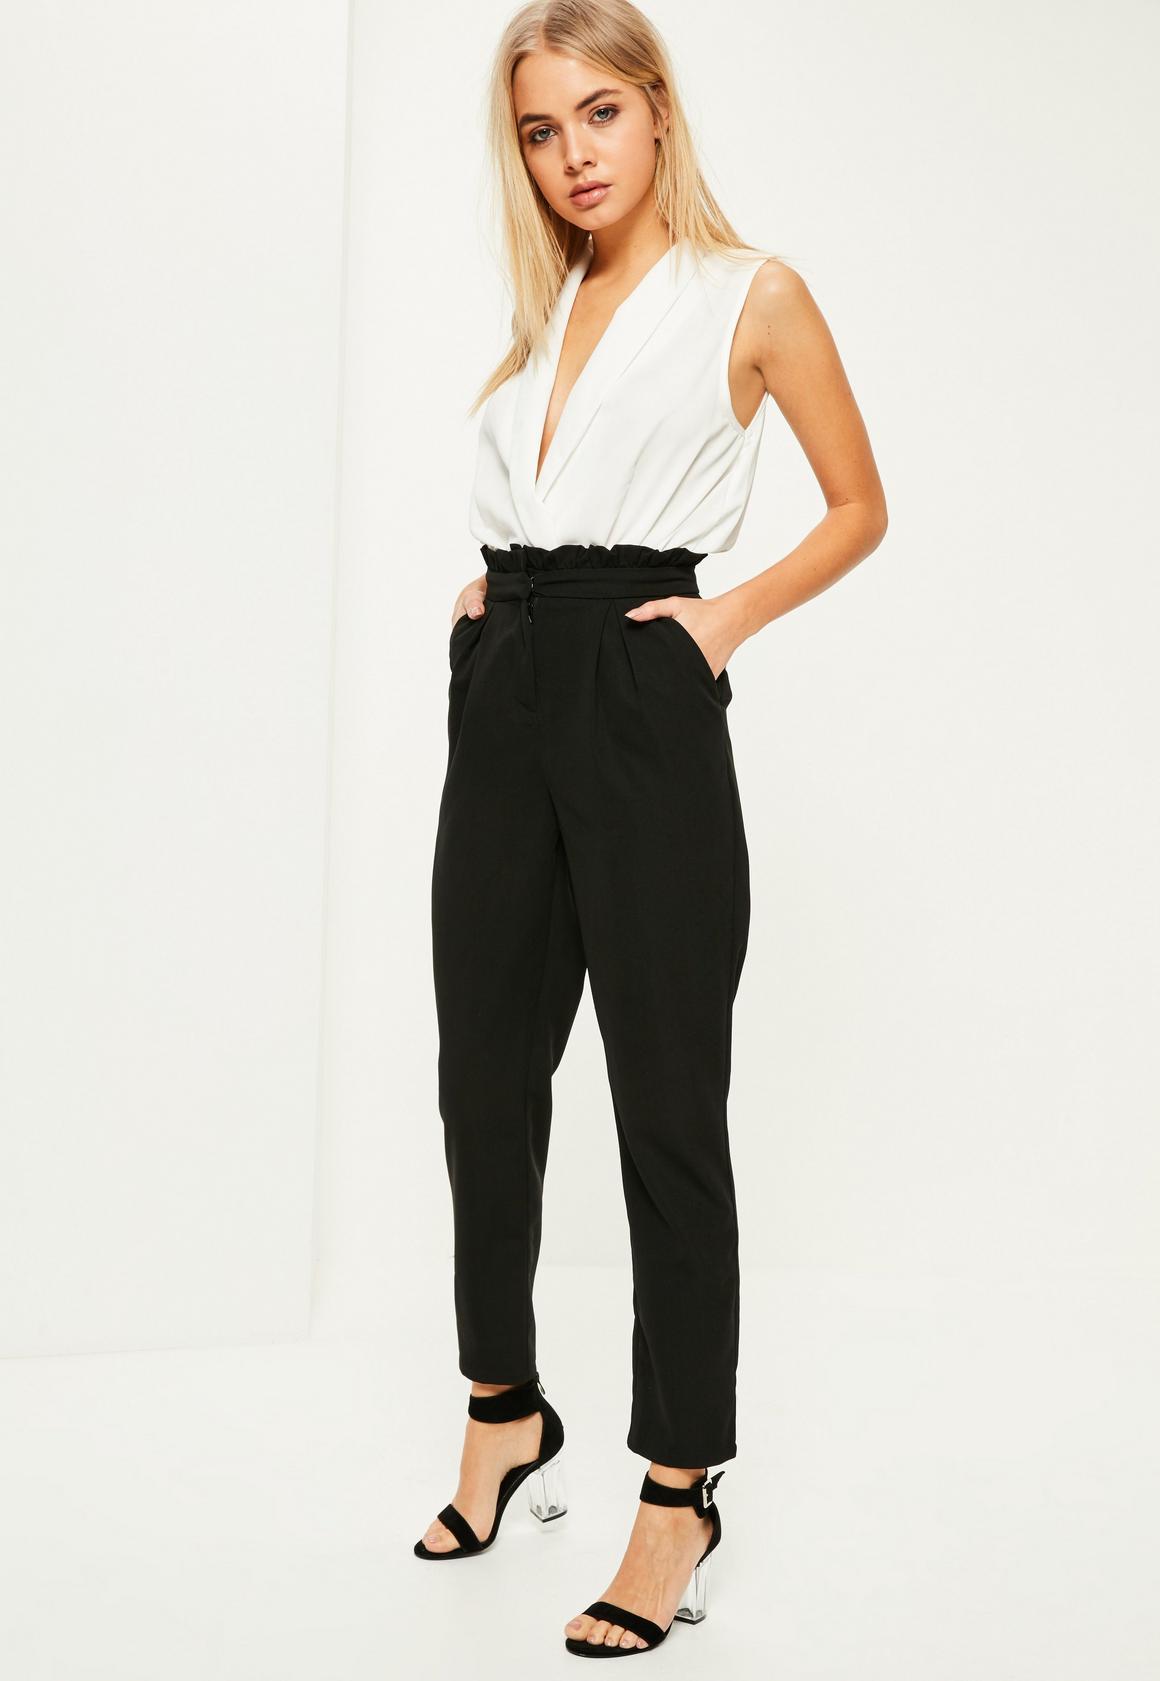 Paper bag trousers - Black Paperbag Waist Cigarette Trousers Previous Next